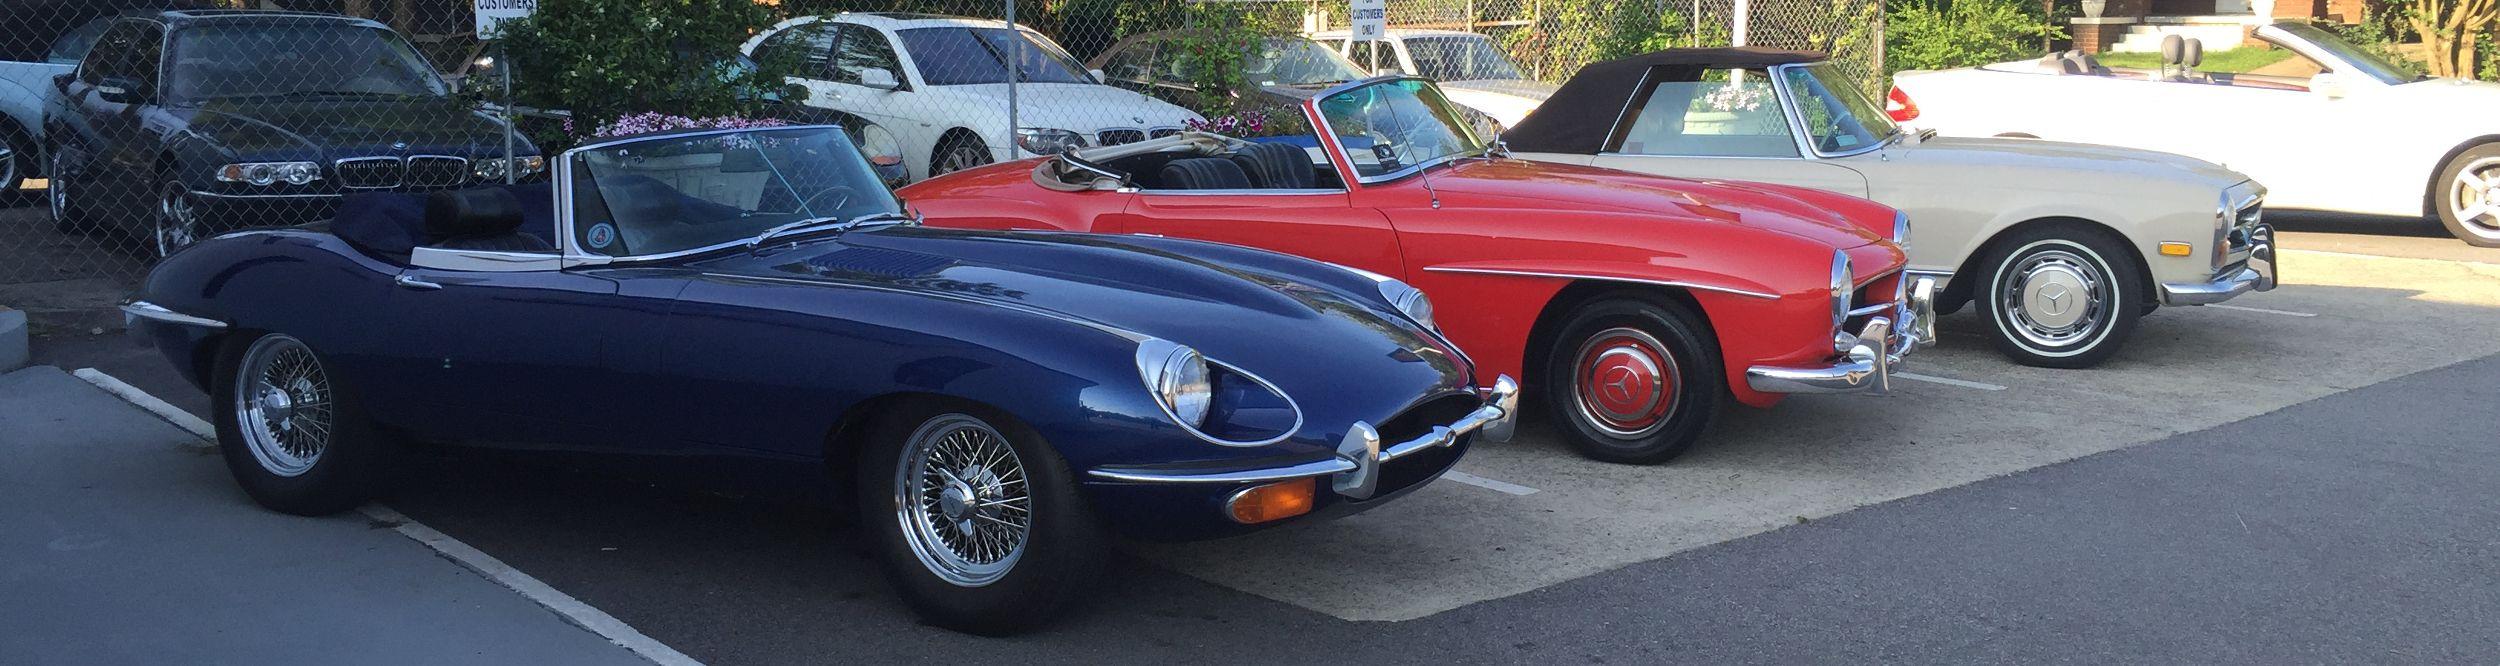 Jaguar Repair Shop In Columbia Sc Import Specialties Of Oil Pan Gasket X Type